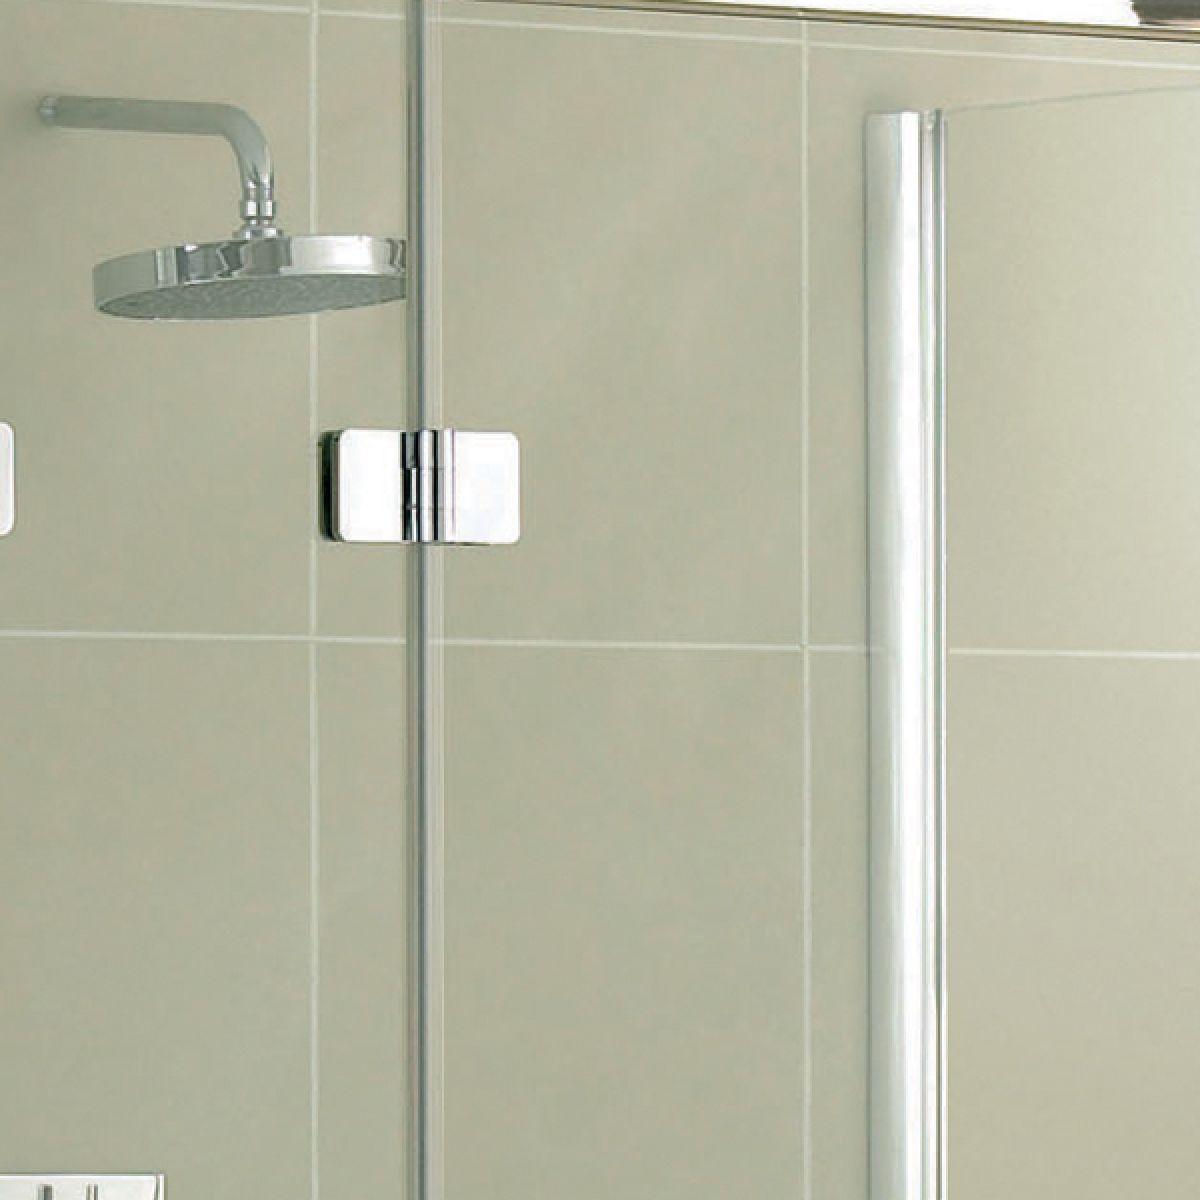 Aquadart Inline 3 Sided Hinged Door Shower Enclosure Detail 2